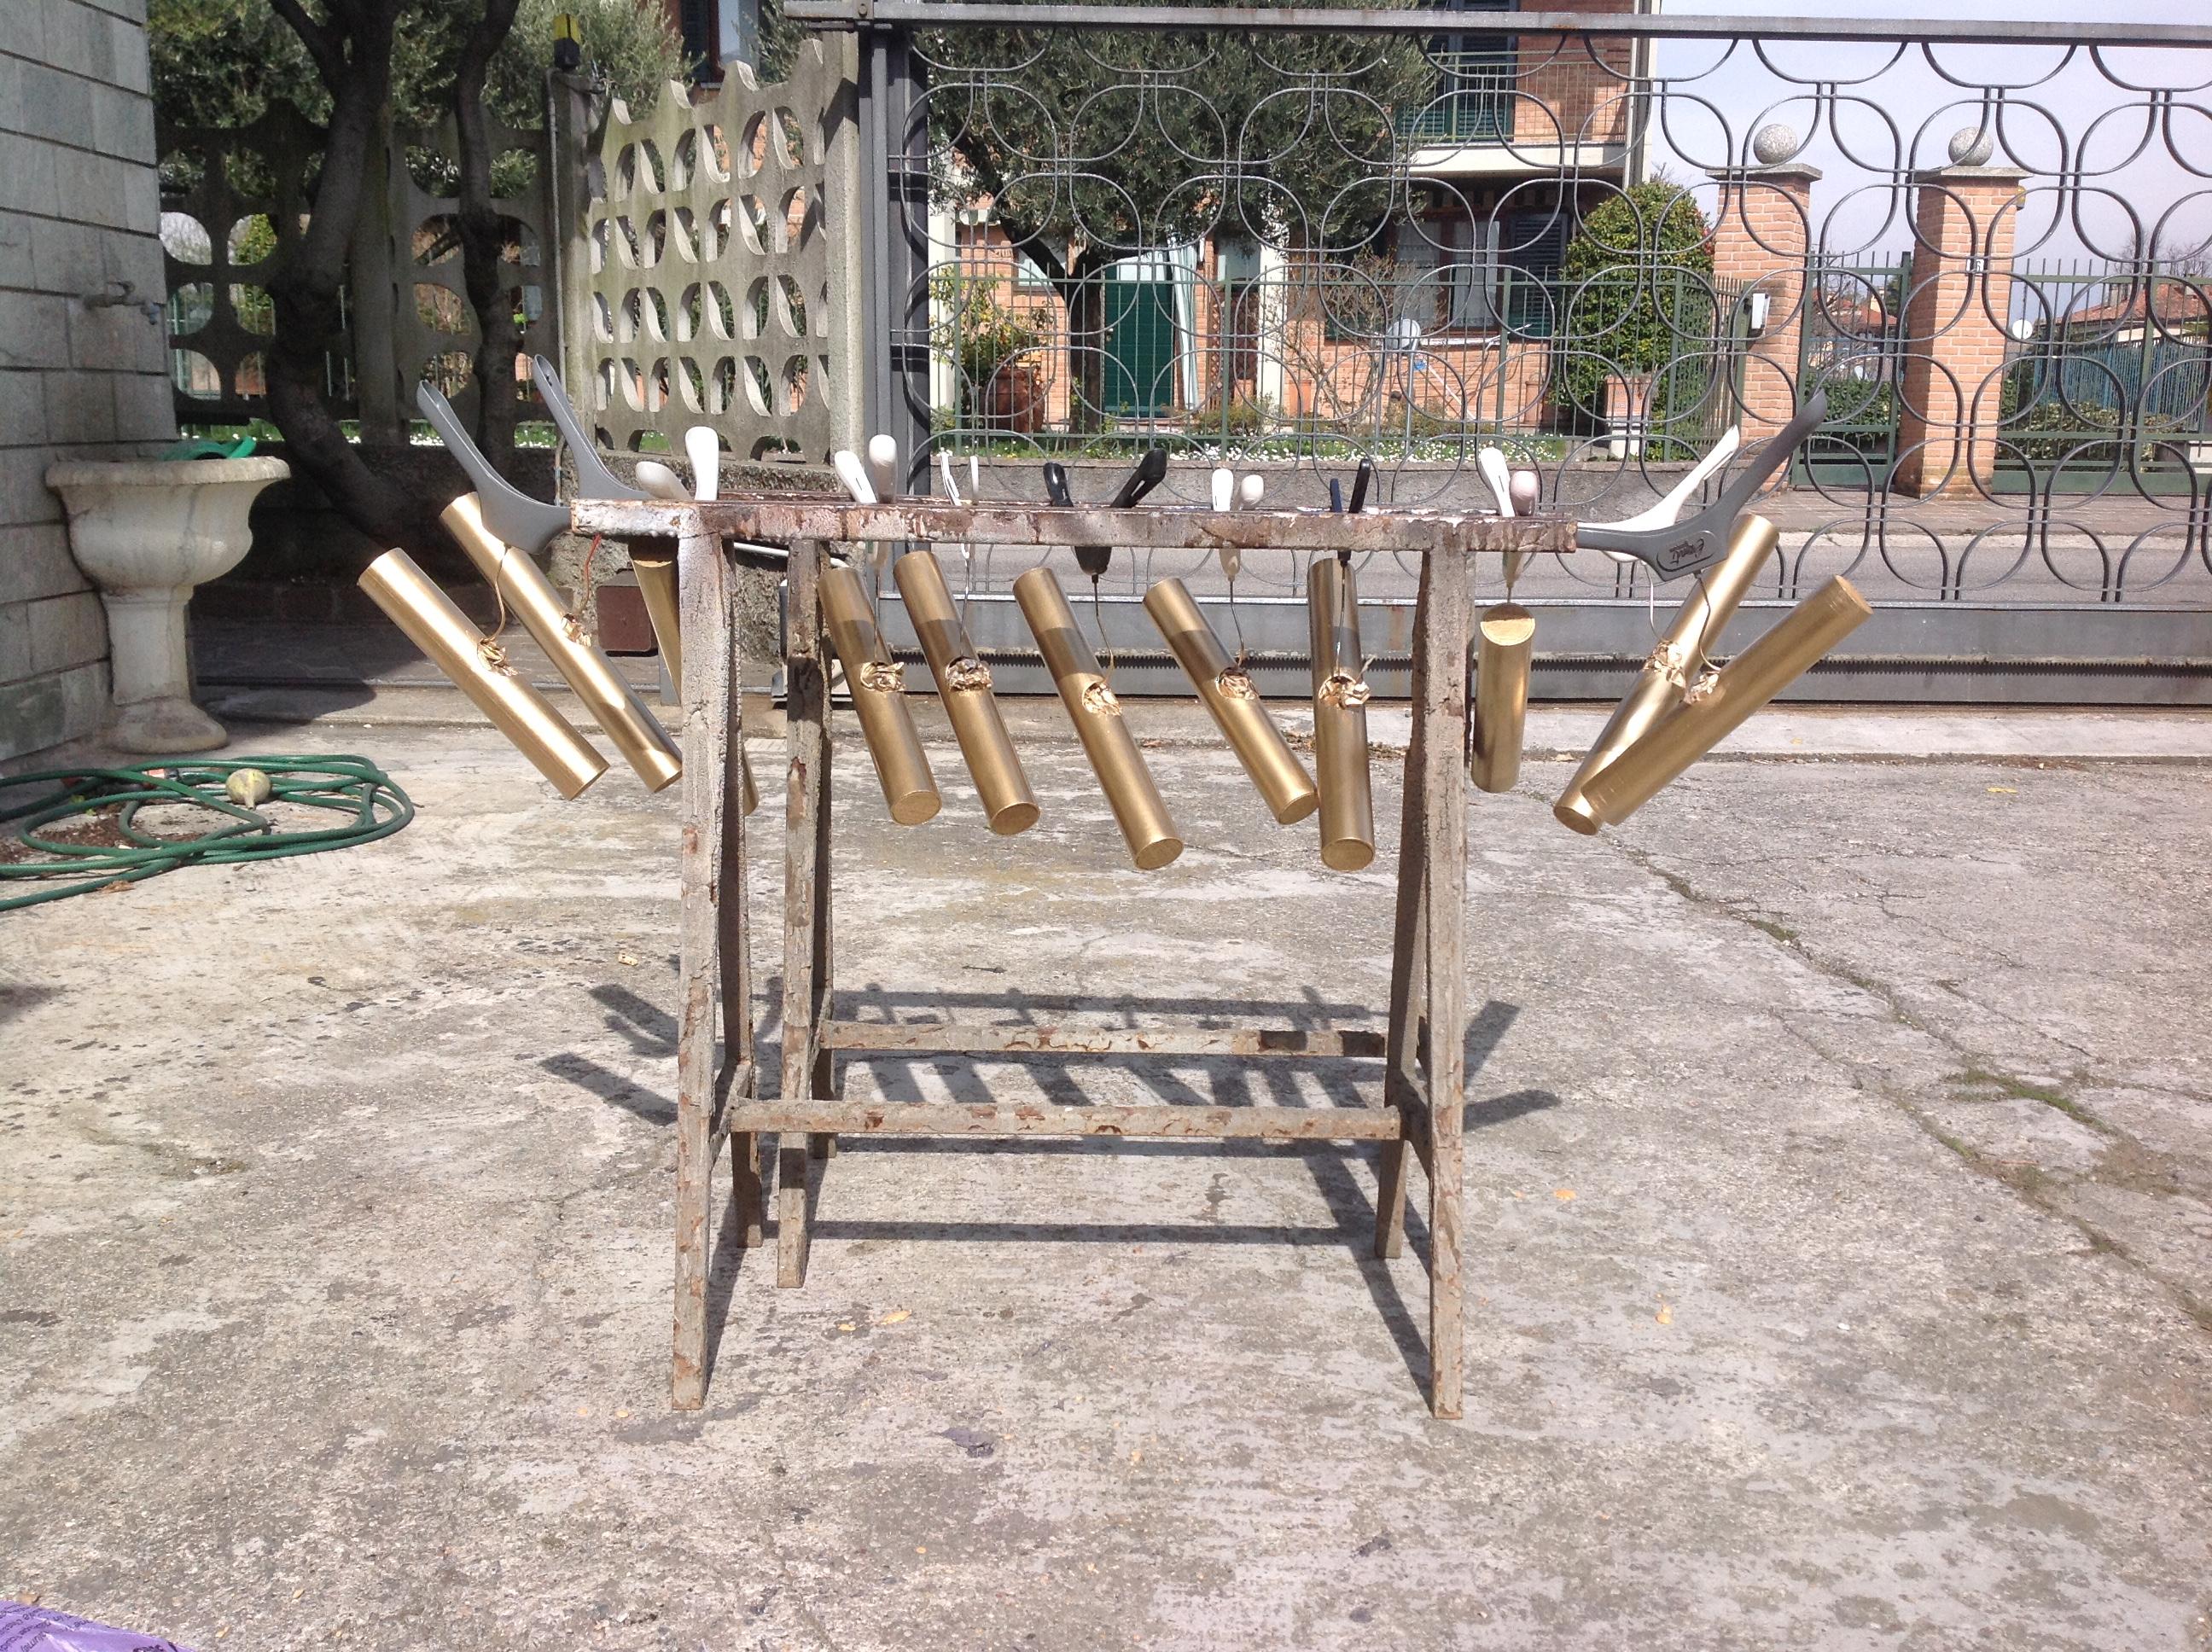 costruzione Marimba pentatonica modulare